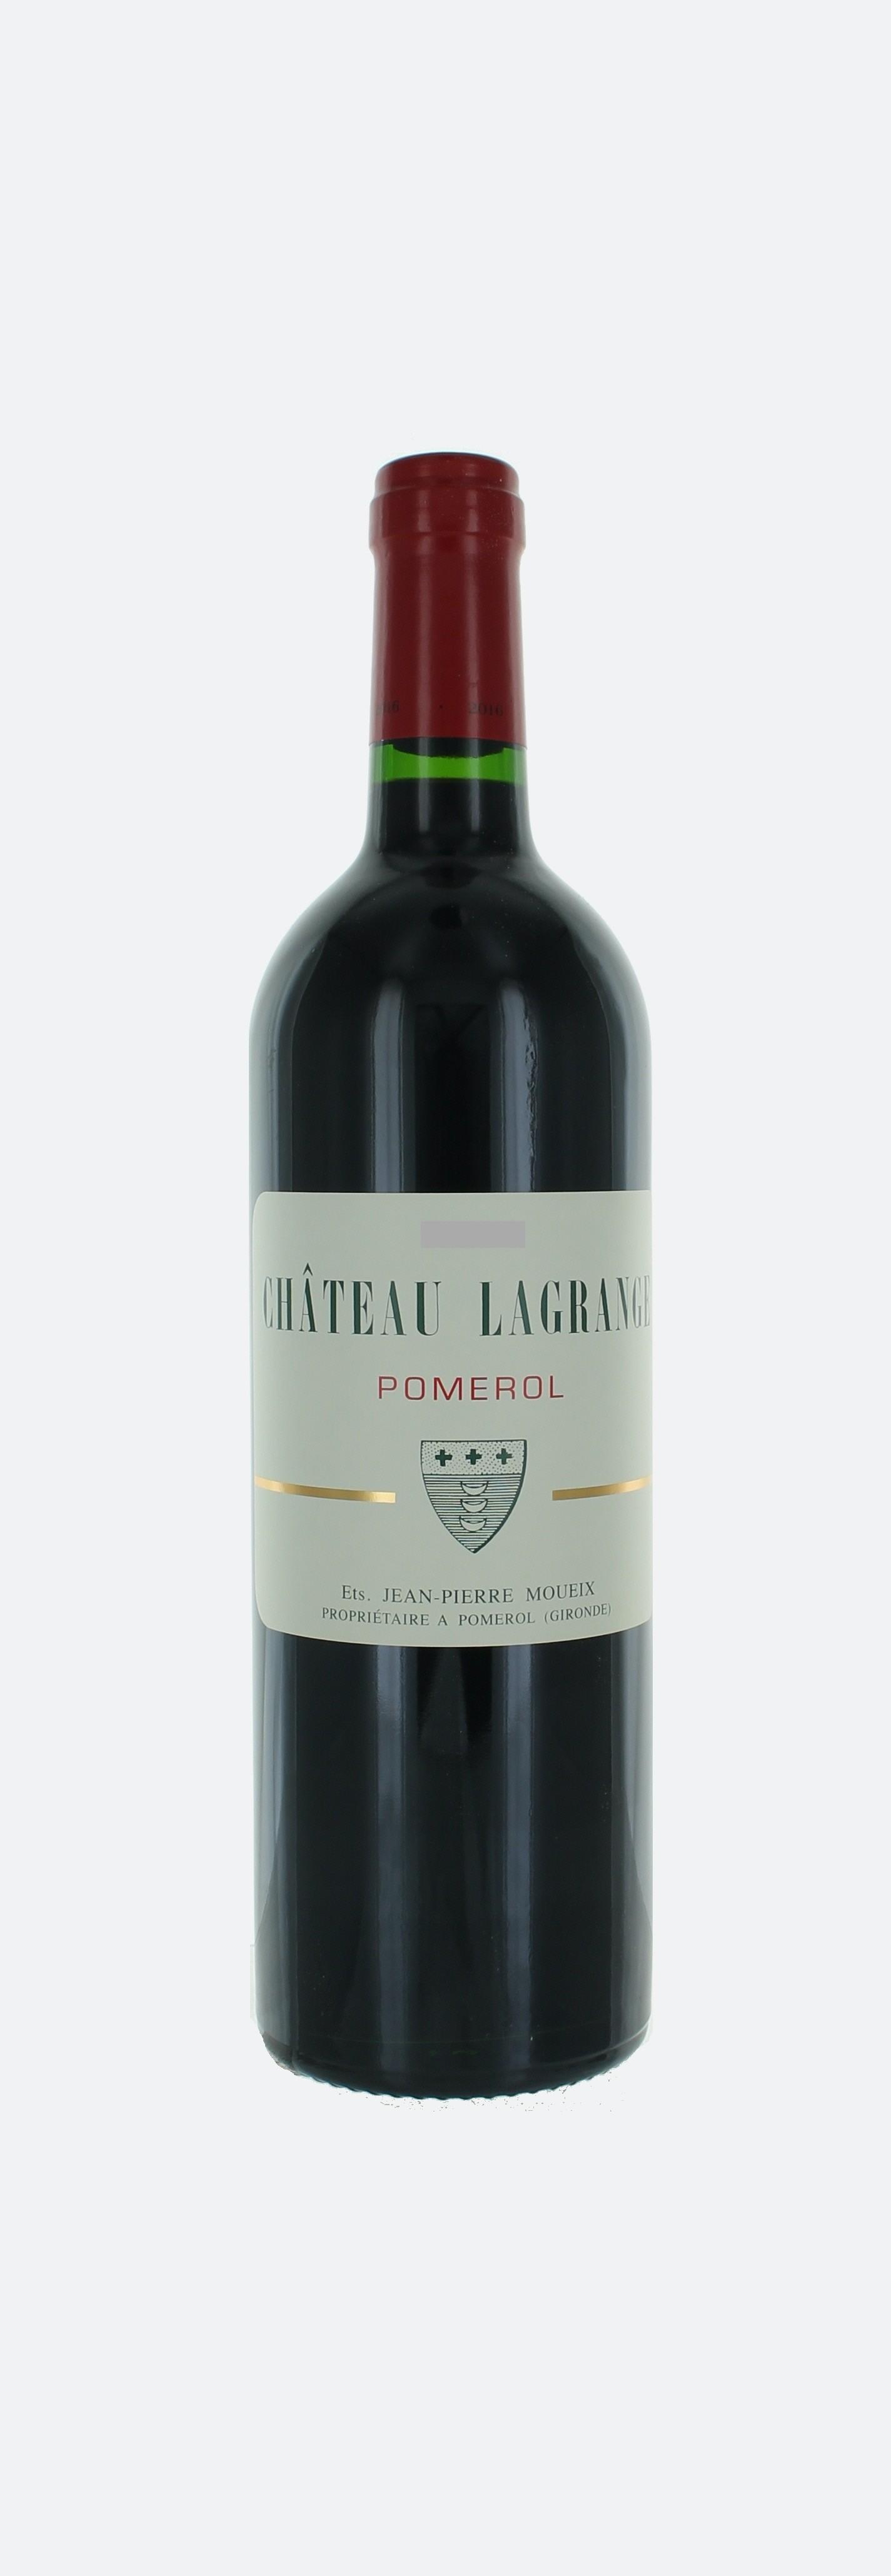 Château Lagrange, Pomerol